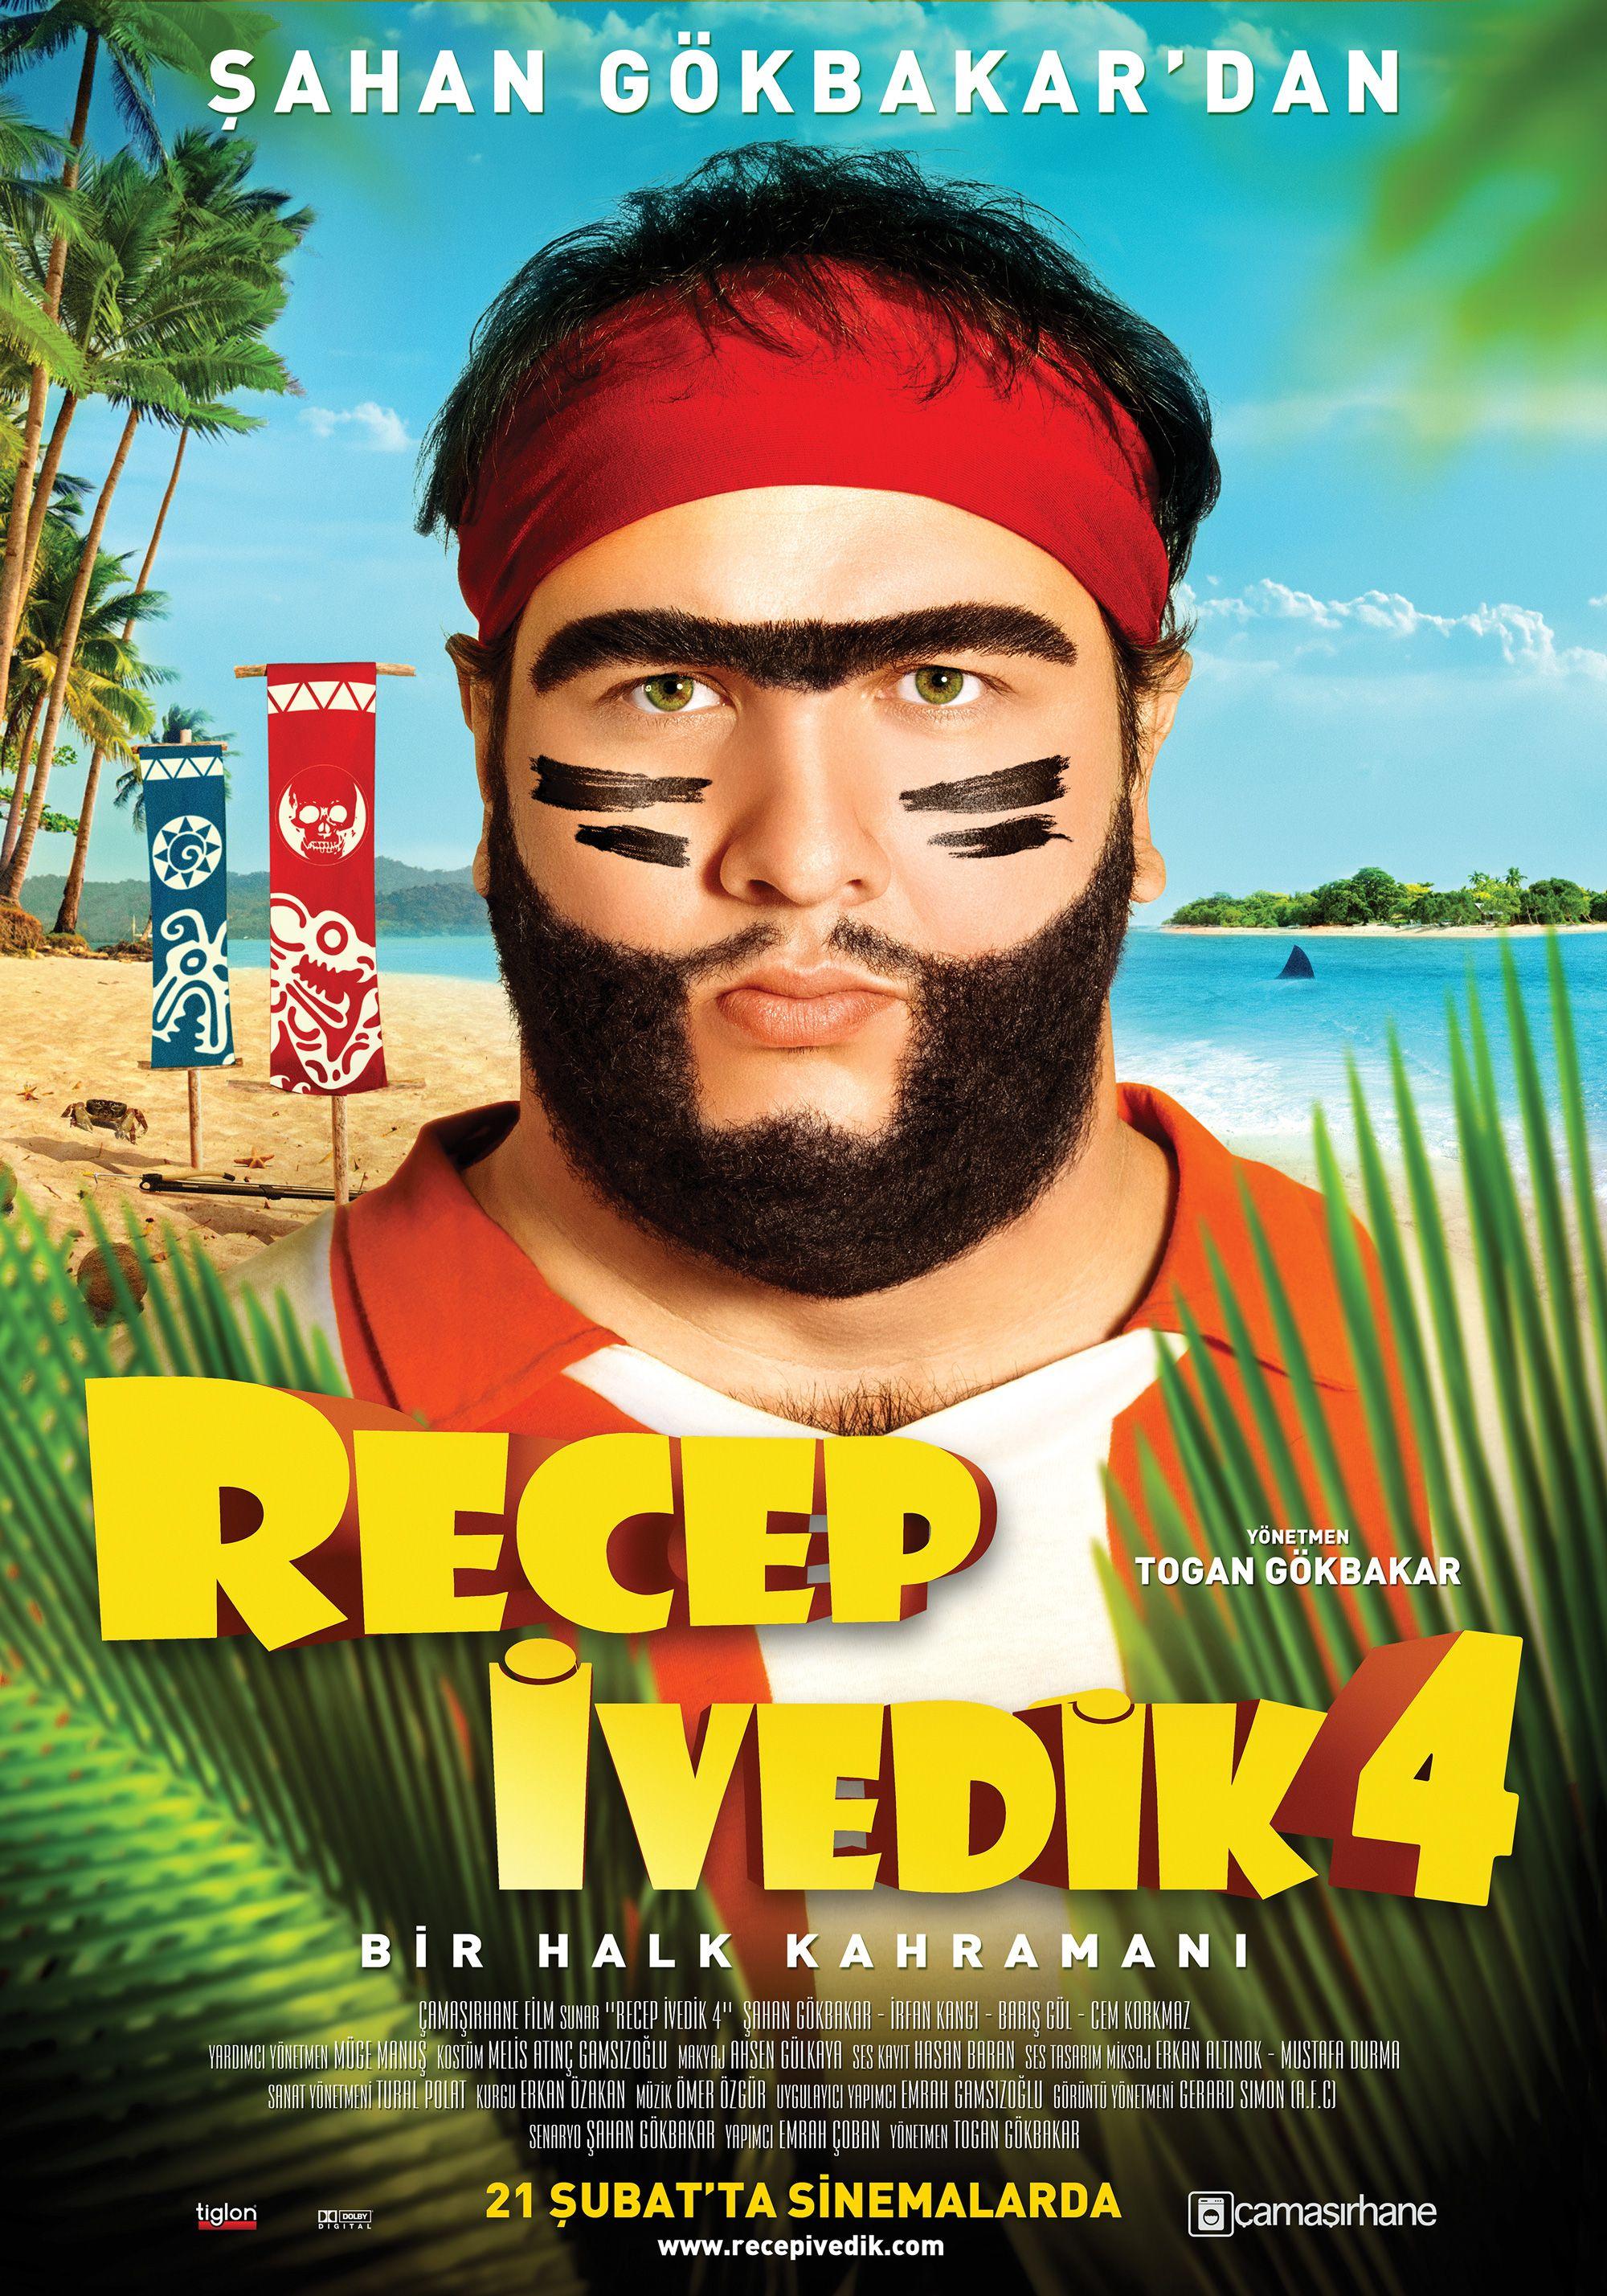 Recep Ivedik 4 21 Subat Cuma Gunu Plato Avm Prestige Sinema Da Komedi Filmleri Film Komik Filmler